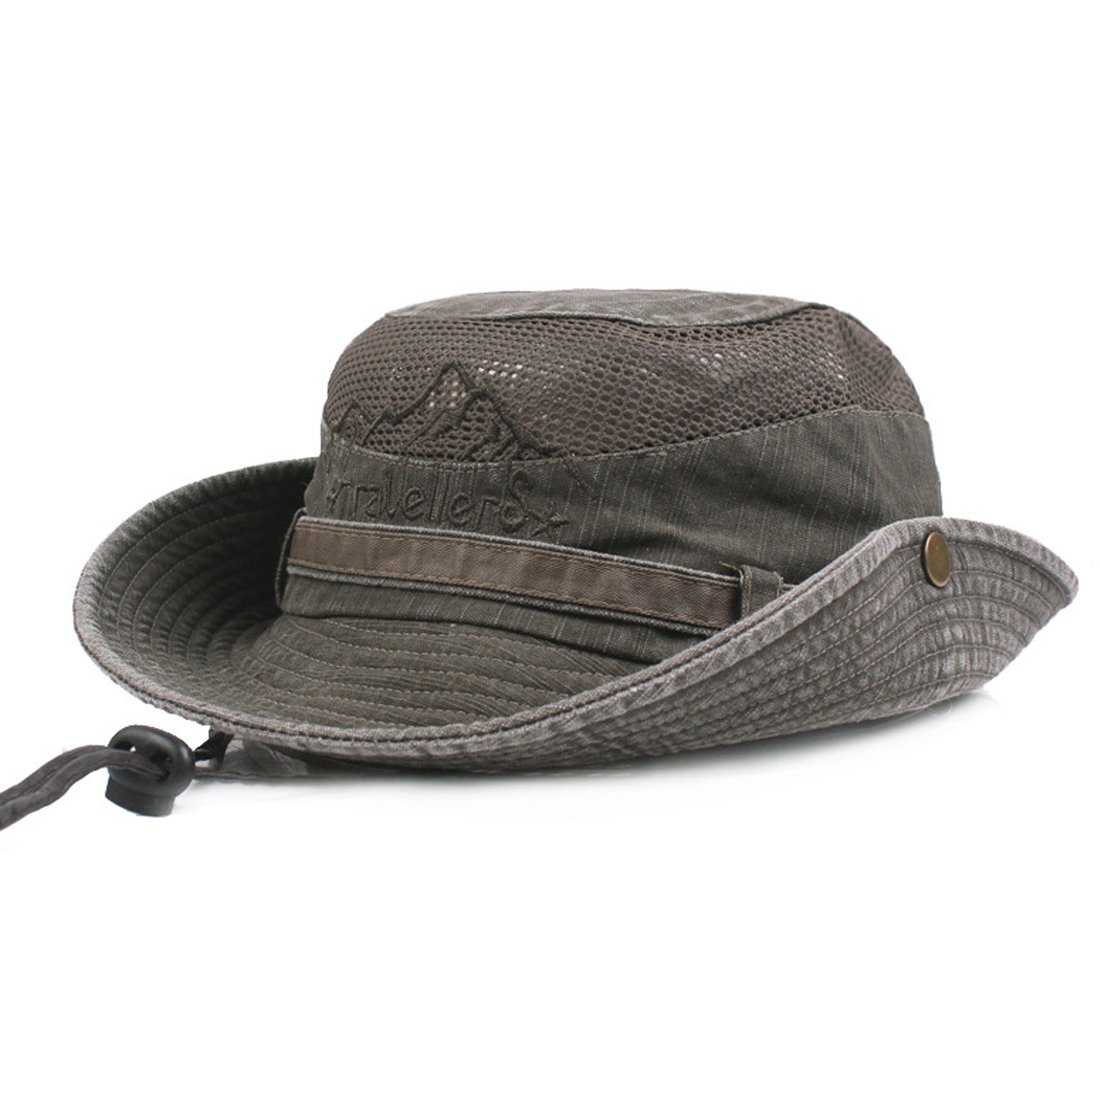 Belsen Mens Boonie Hat Summer Sun Caps Foldable Mesh Fishing Hat